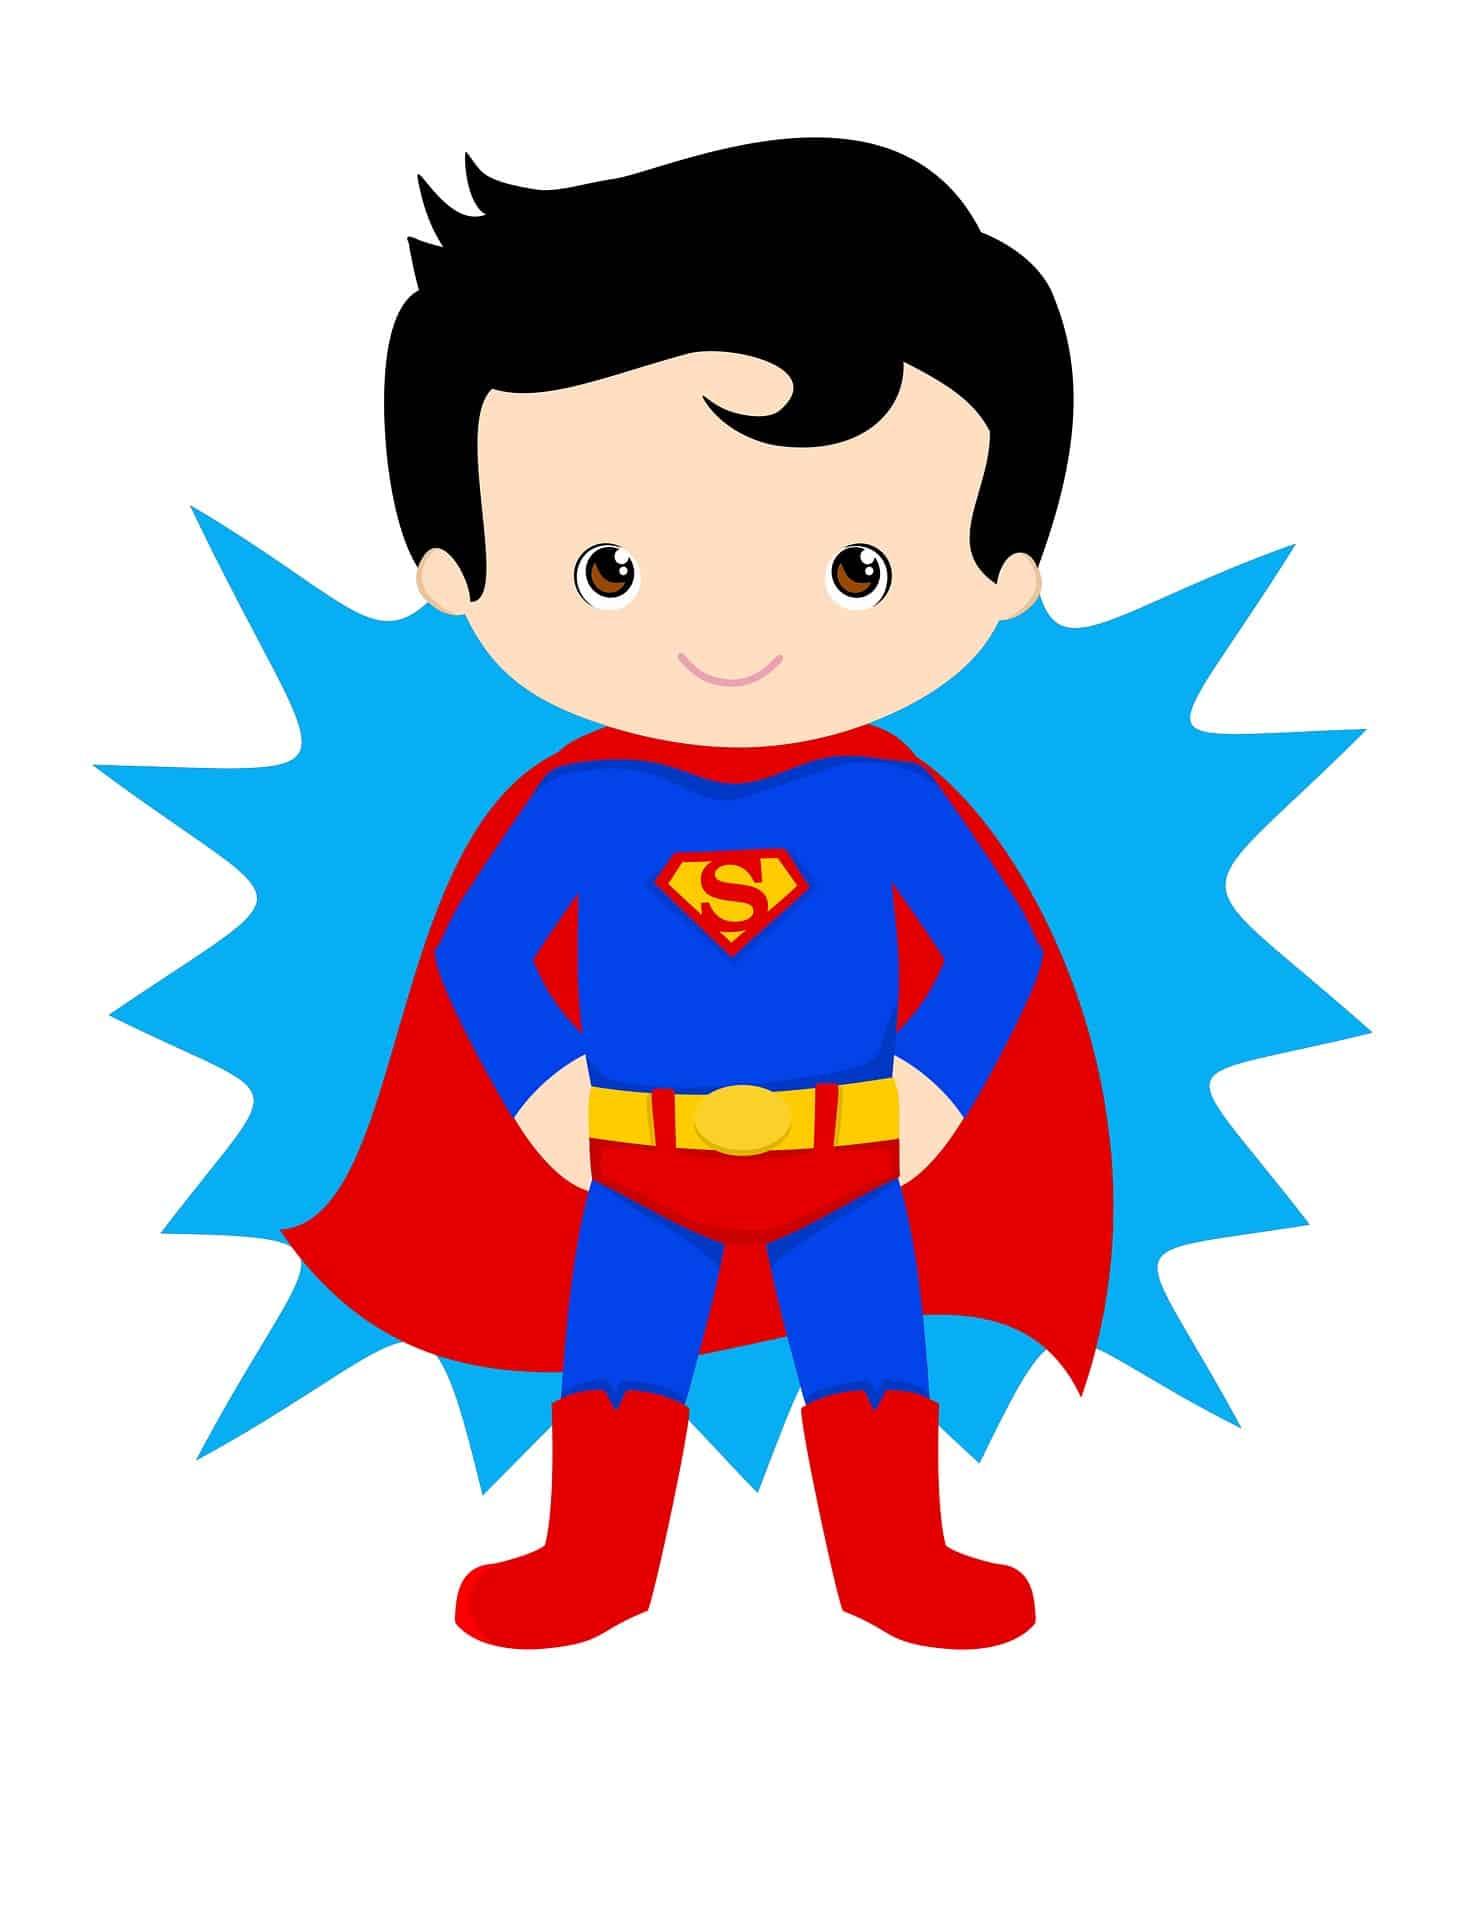 superpoderes genéticos